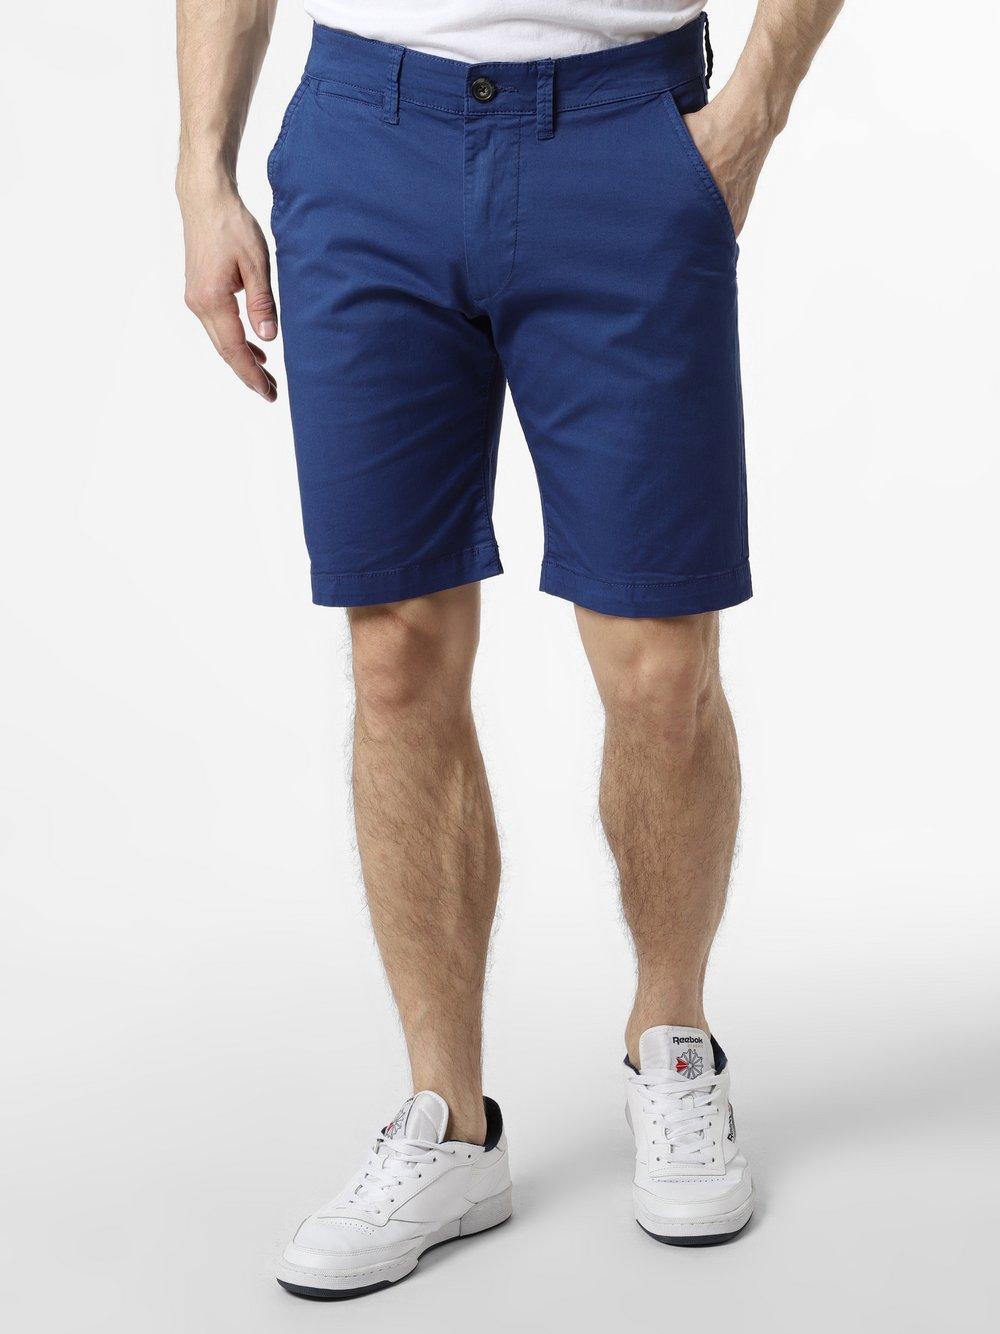 Pepe Jeans - Spodenki męskie – Mc Queen, niebieski